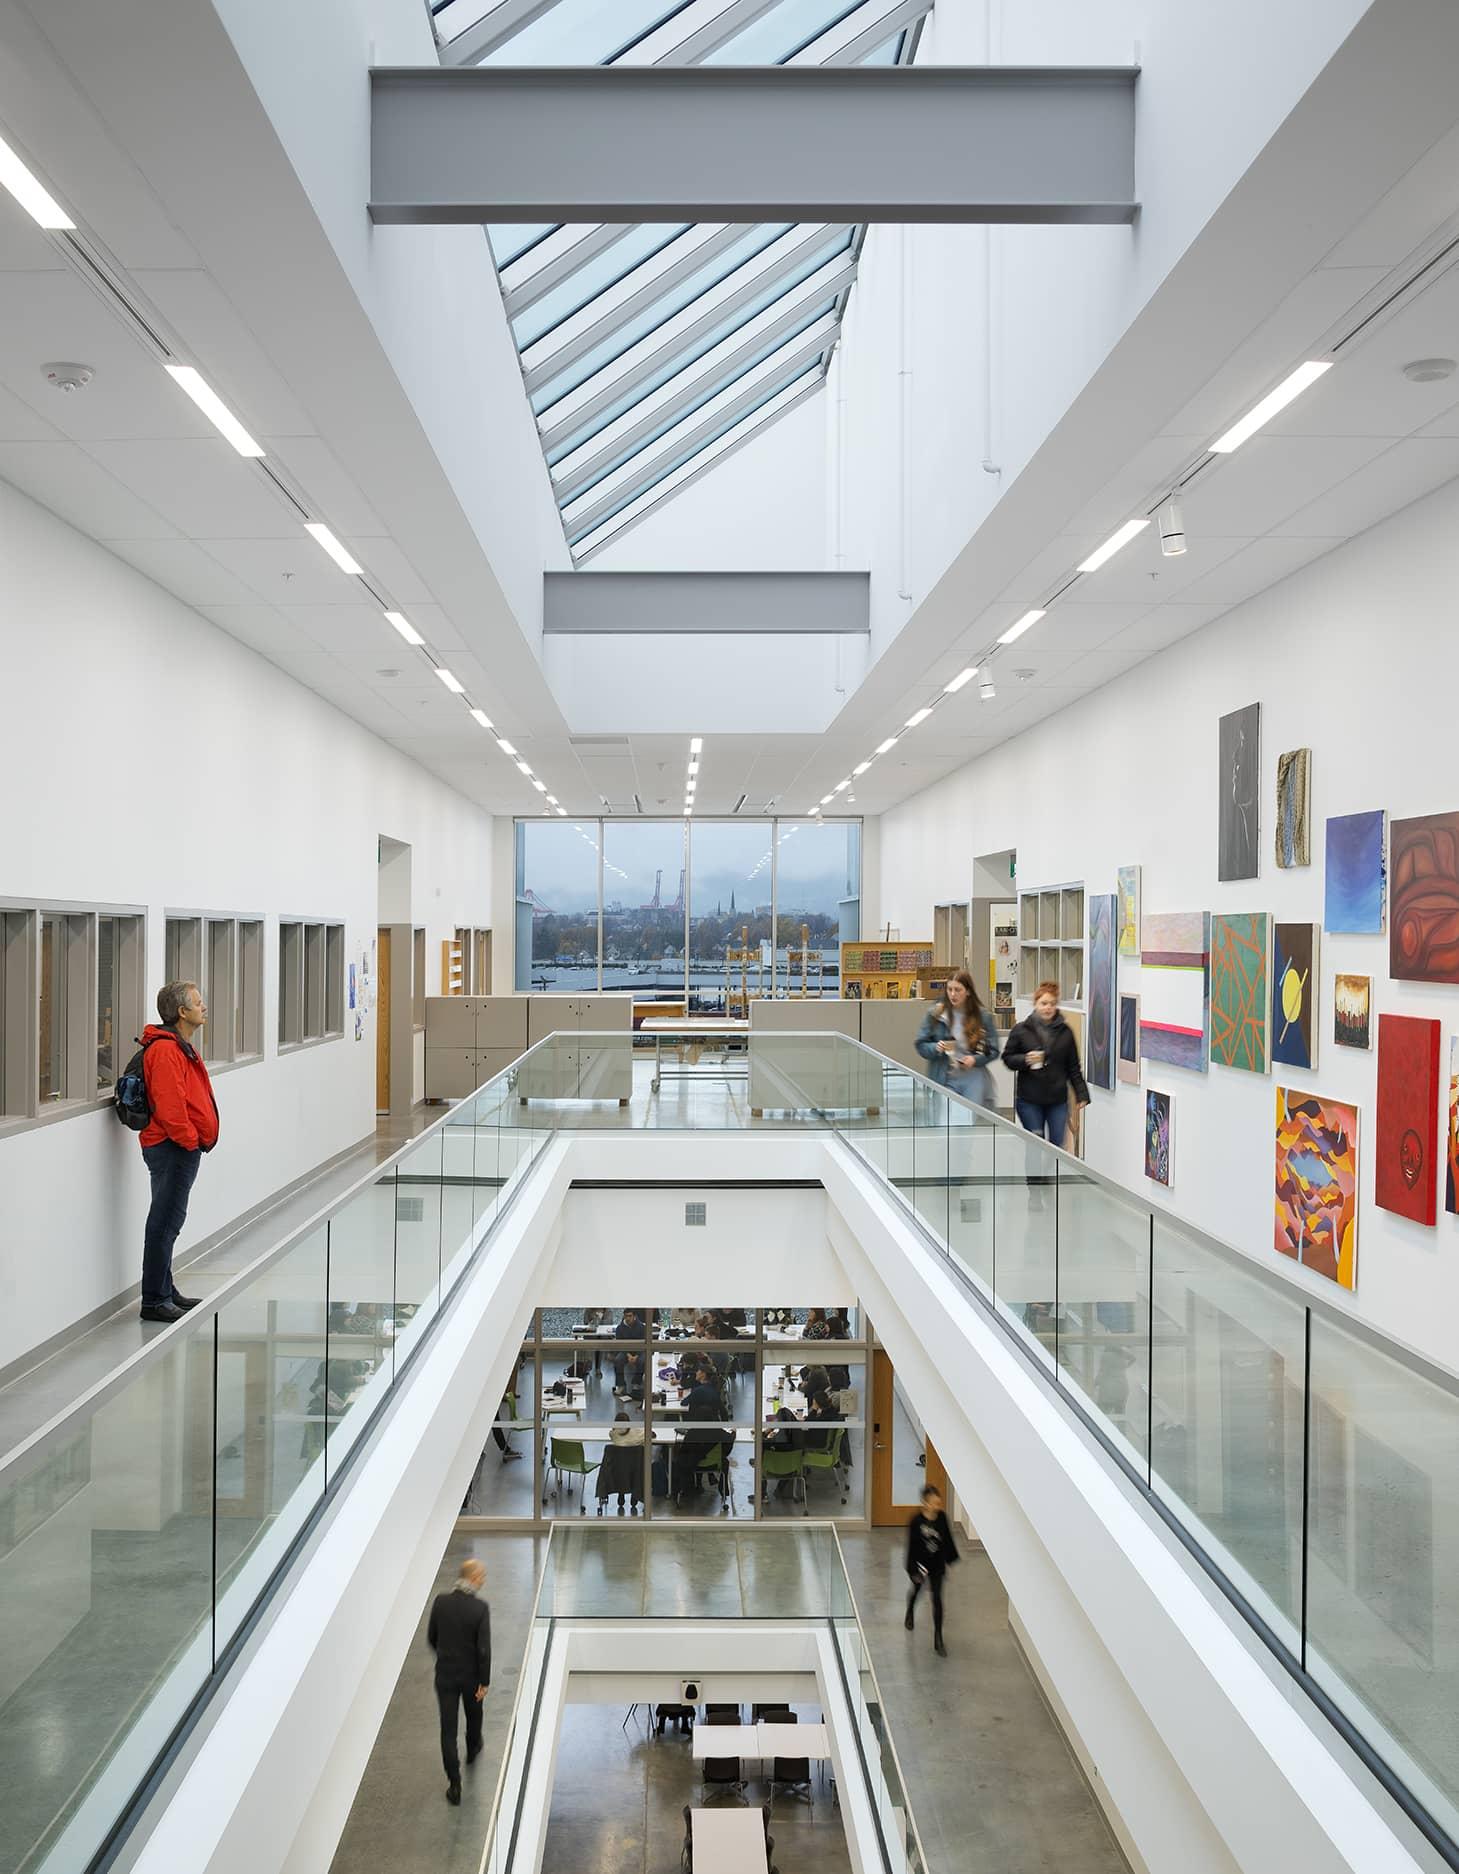 bbp emily carr university of art + design hall gallery